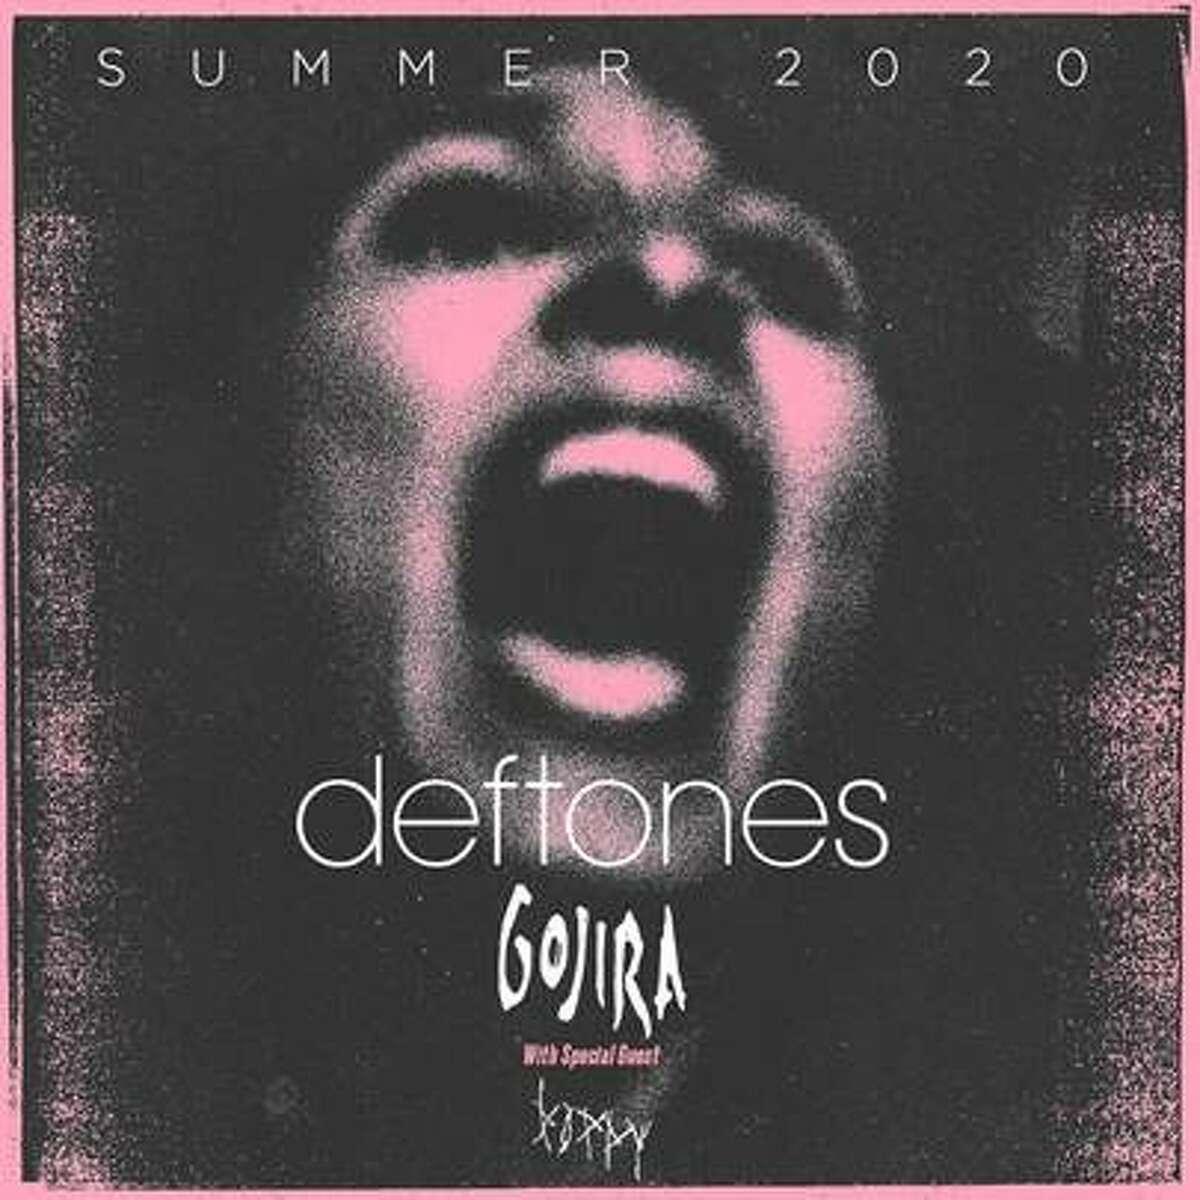 Multiplatinum, Grammy award-winning alternative rock band Deftones is bringing its summer 2020 tour to Bridgeport